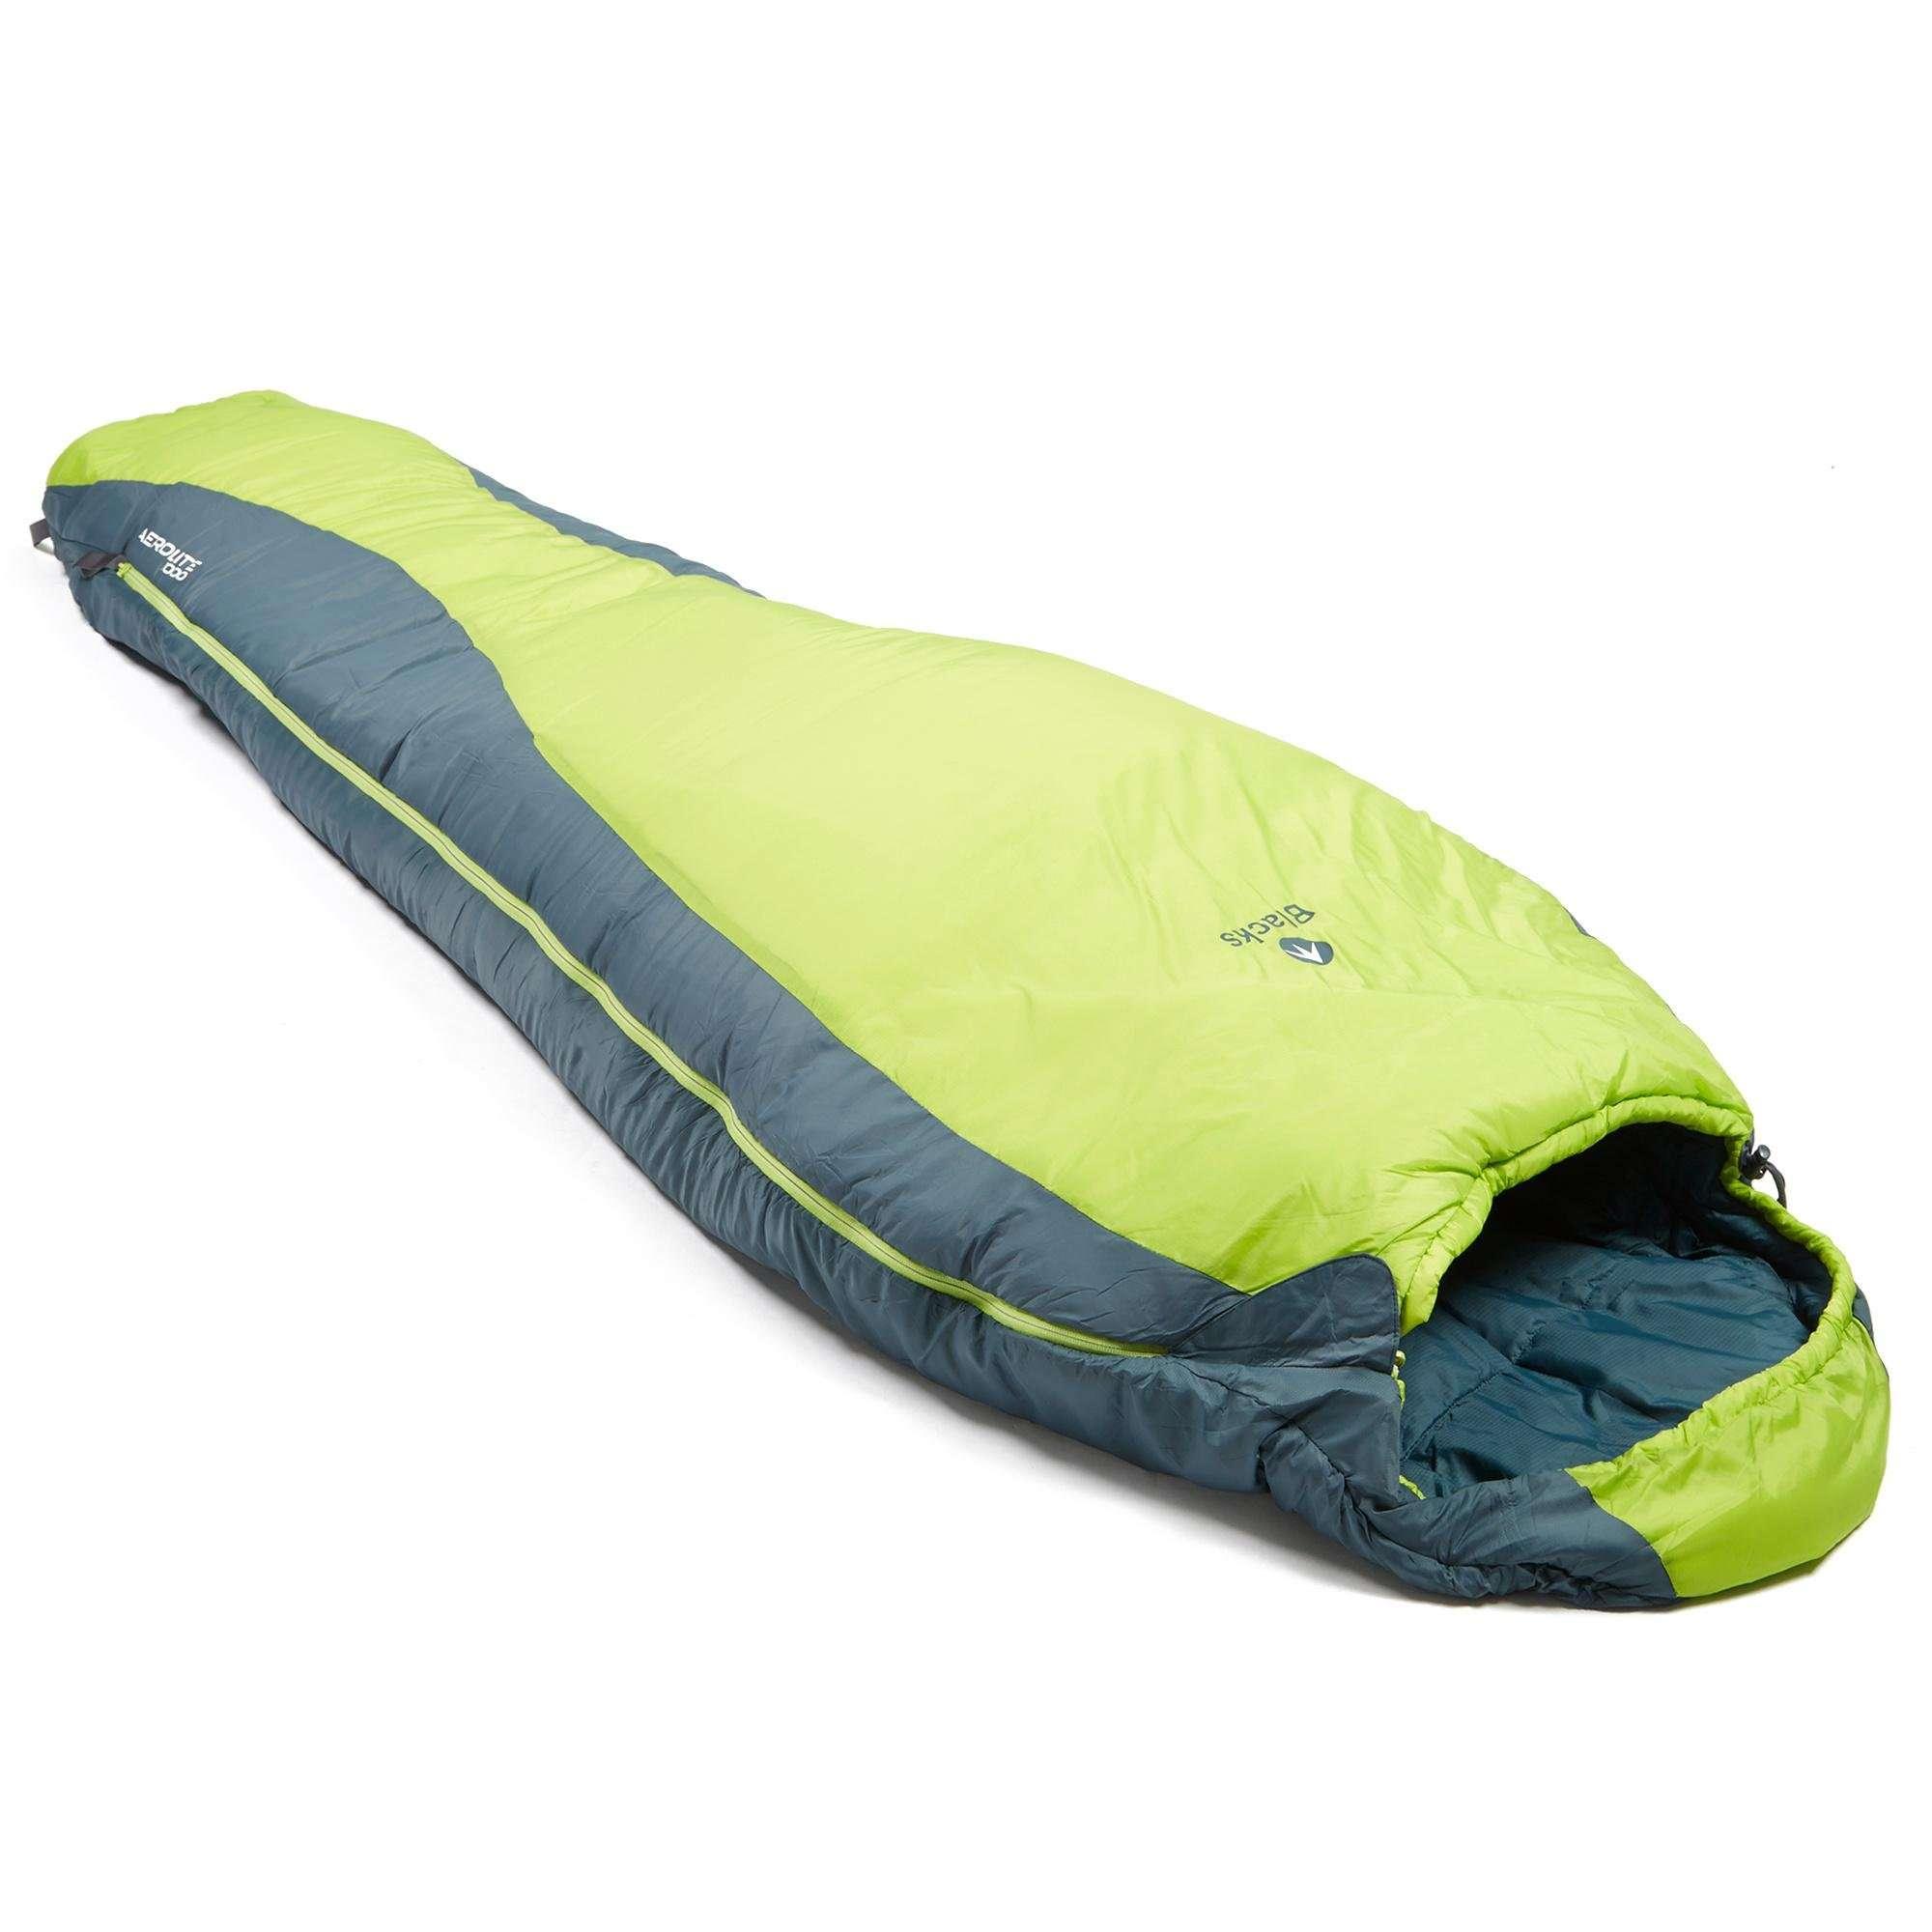 BLACKS Aerolite 1000 Mummy Sleeping Bag